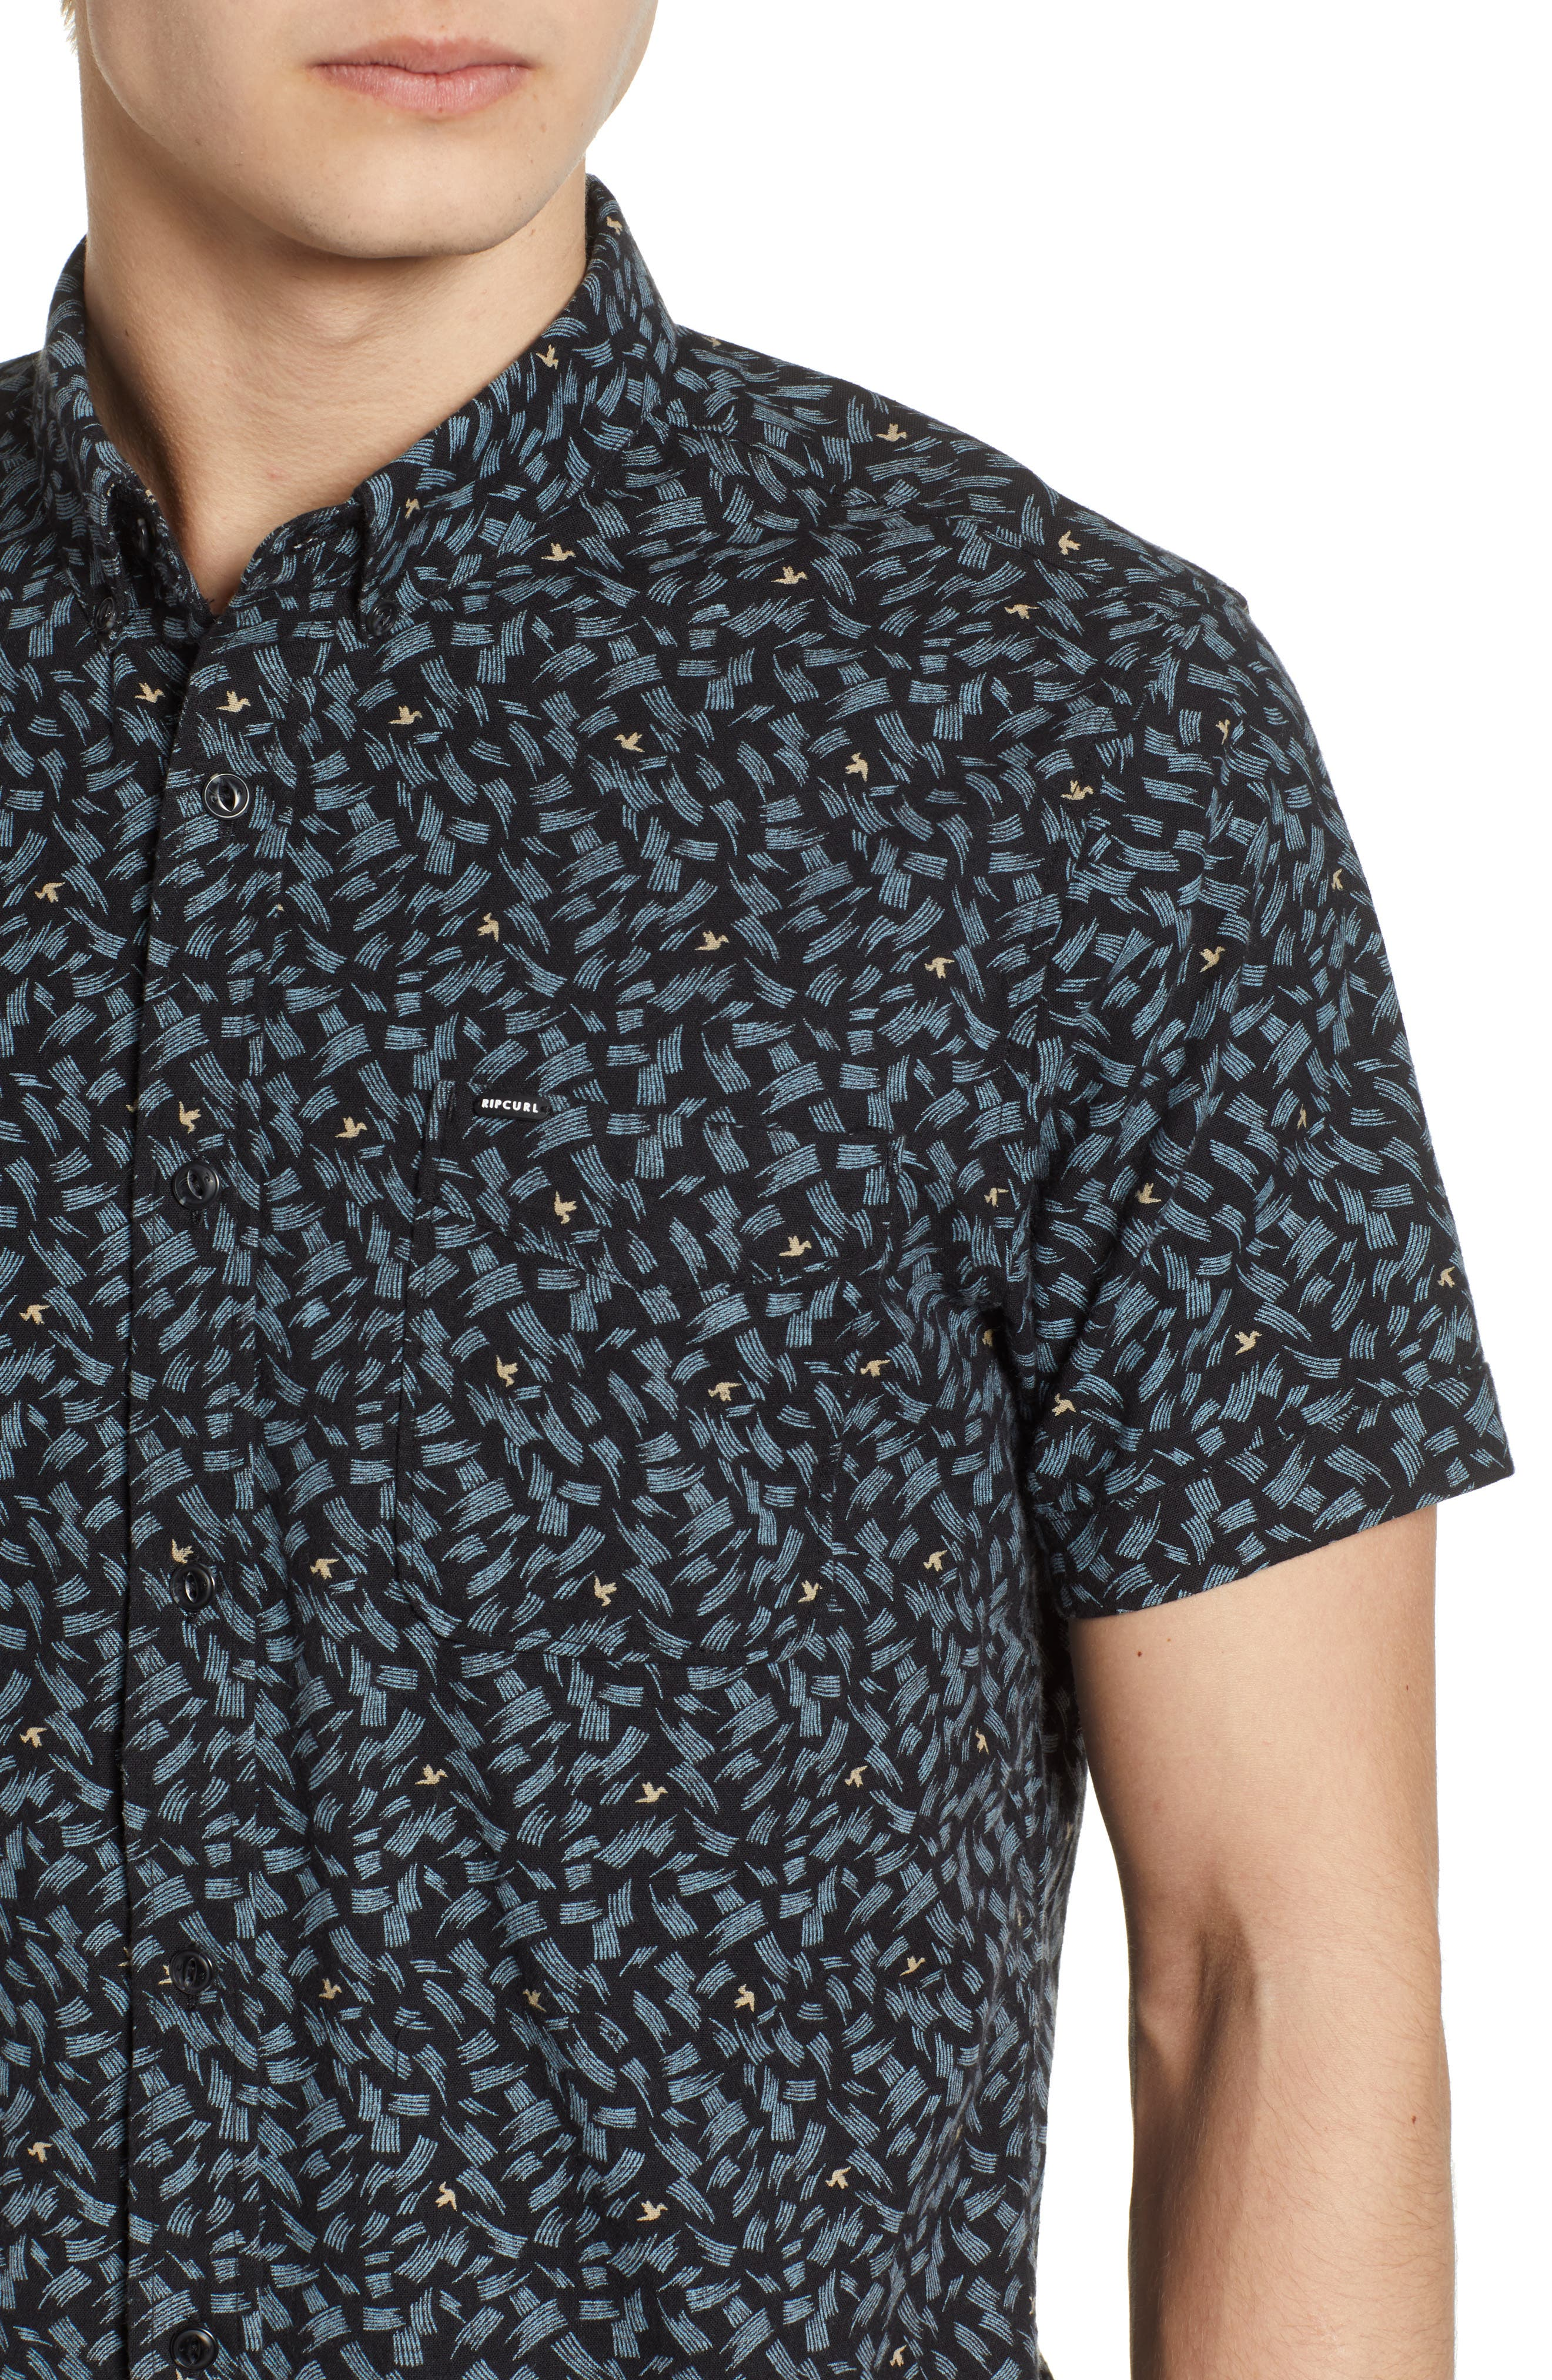 Northern Short Sleeve Shirt,                             Alternate thumbnail 4, color,                             001